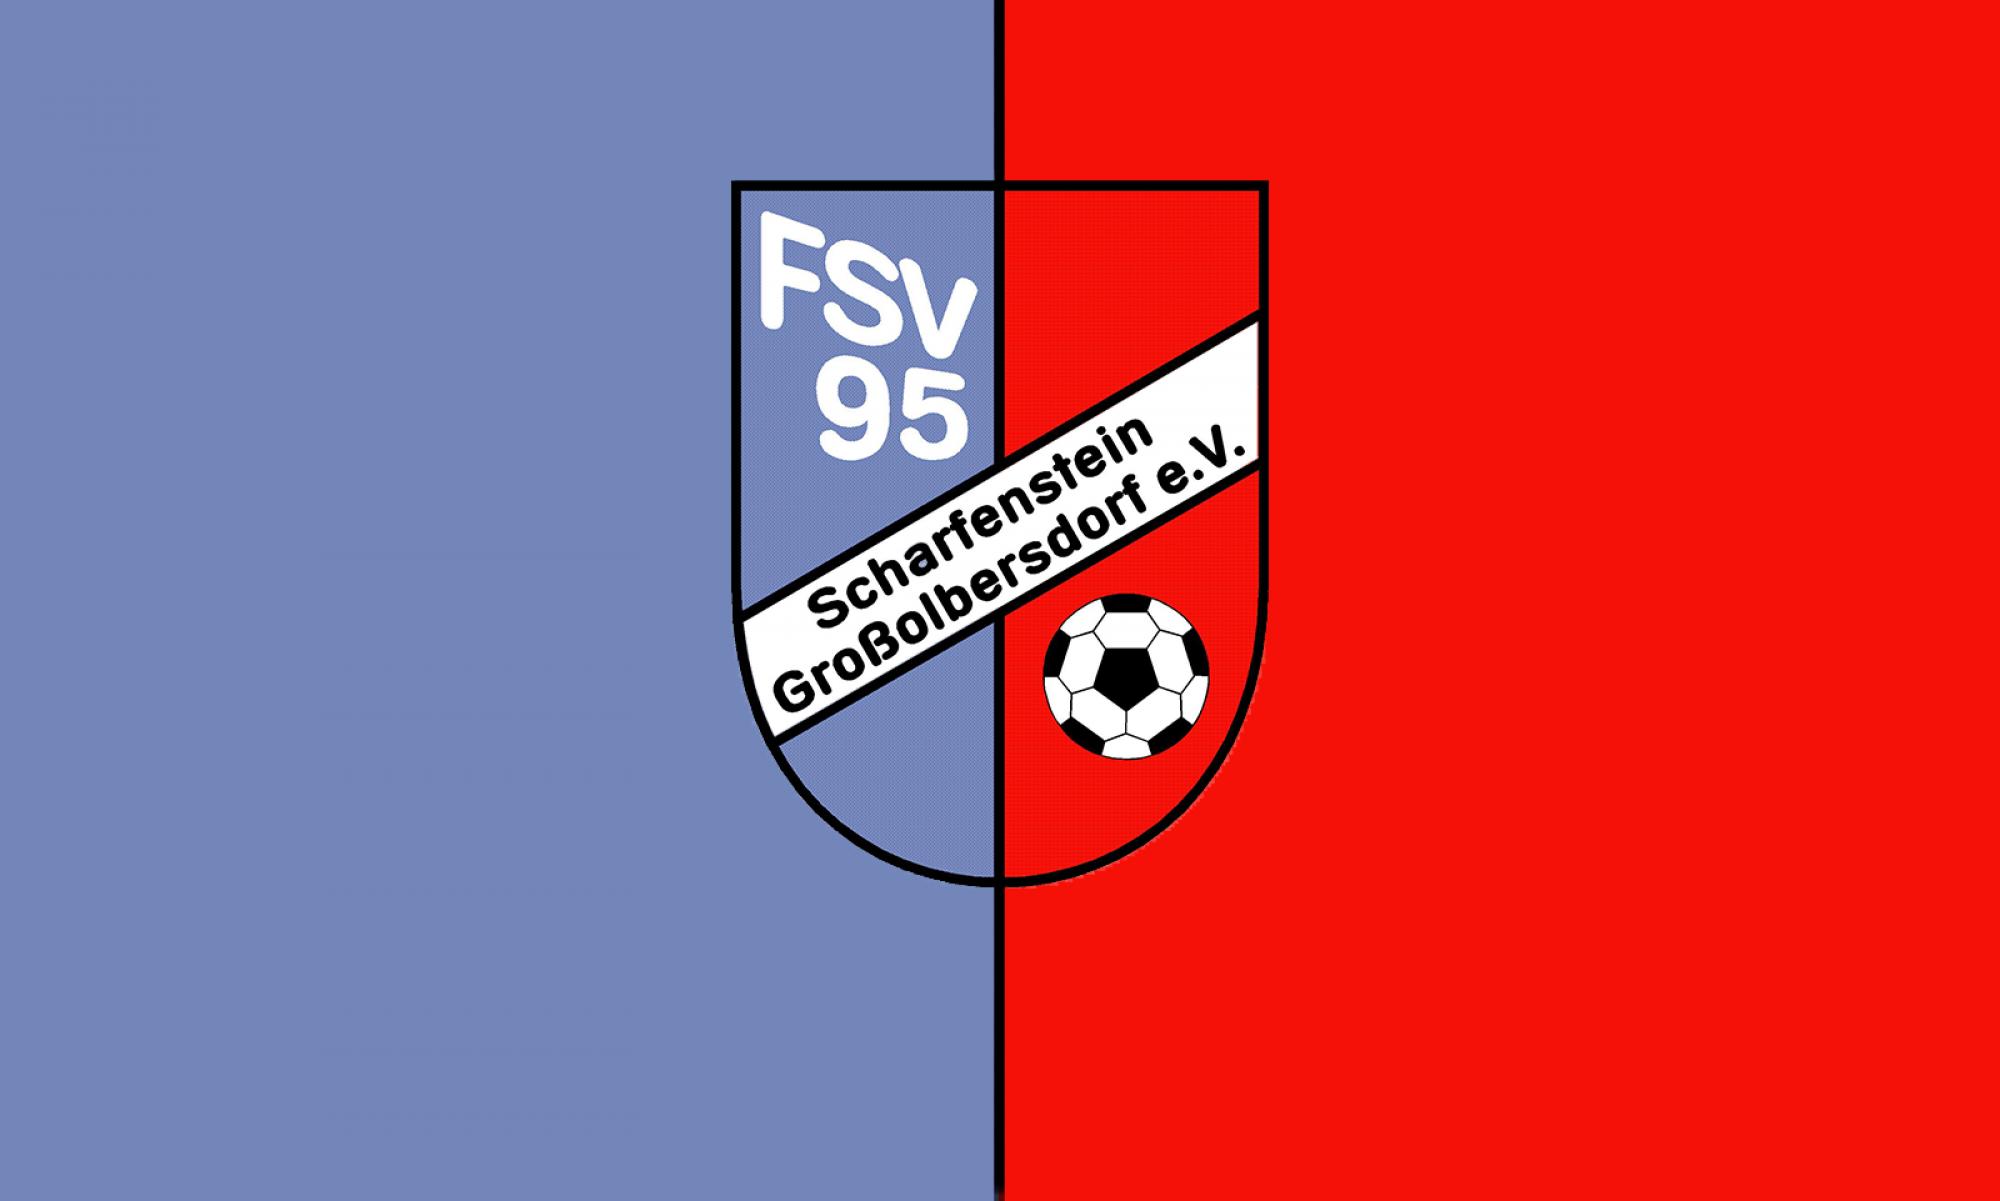 FSV95 Scharfenstein-Großolbersdorf